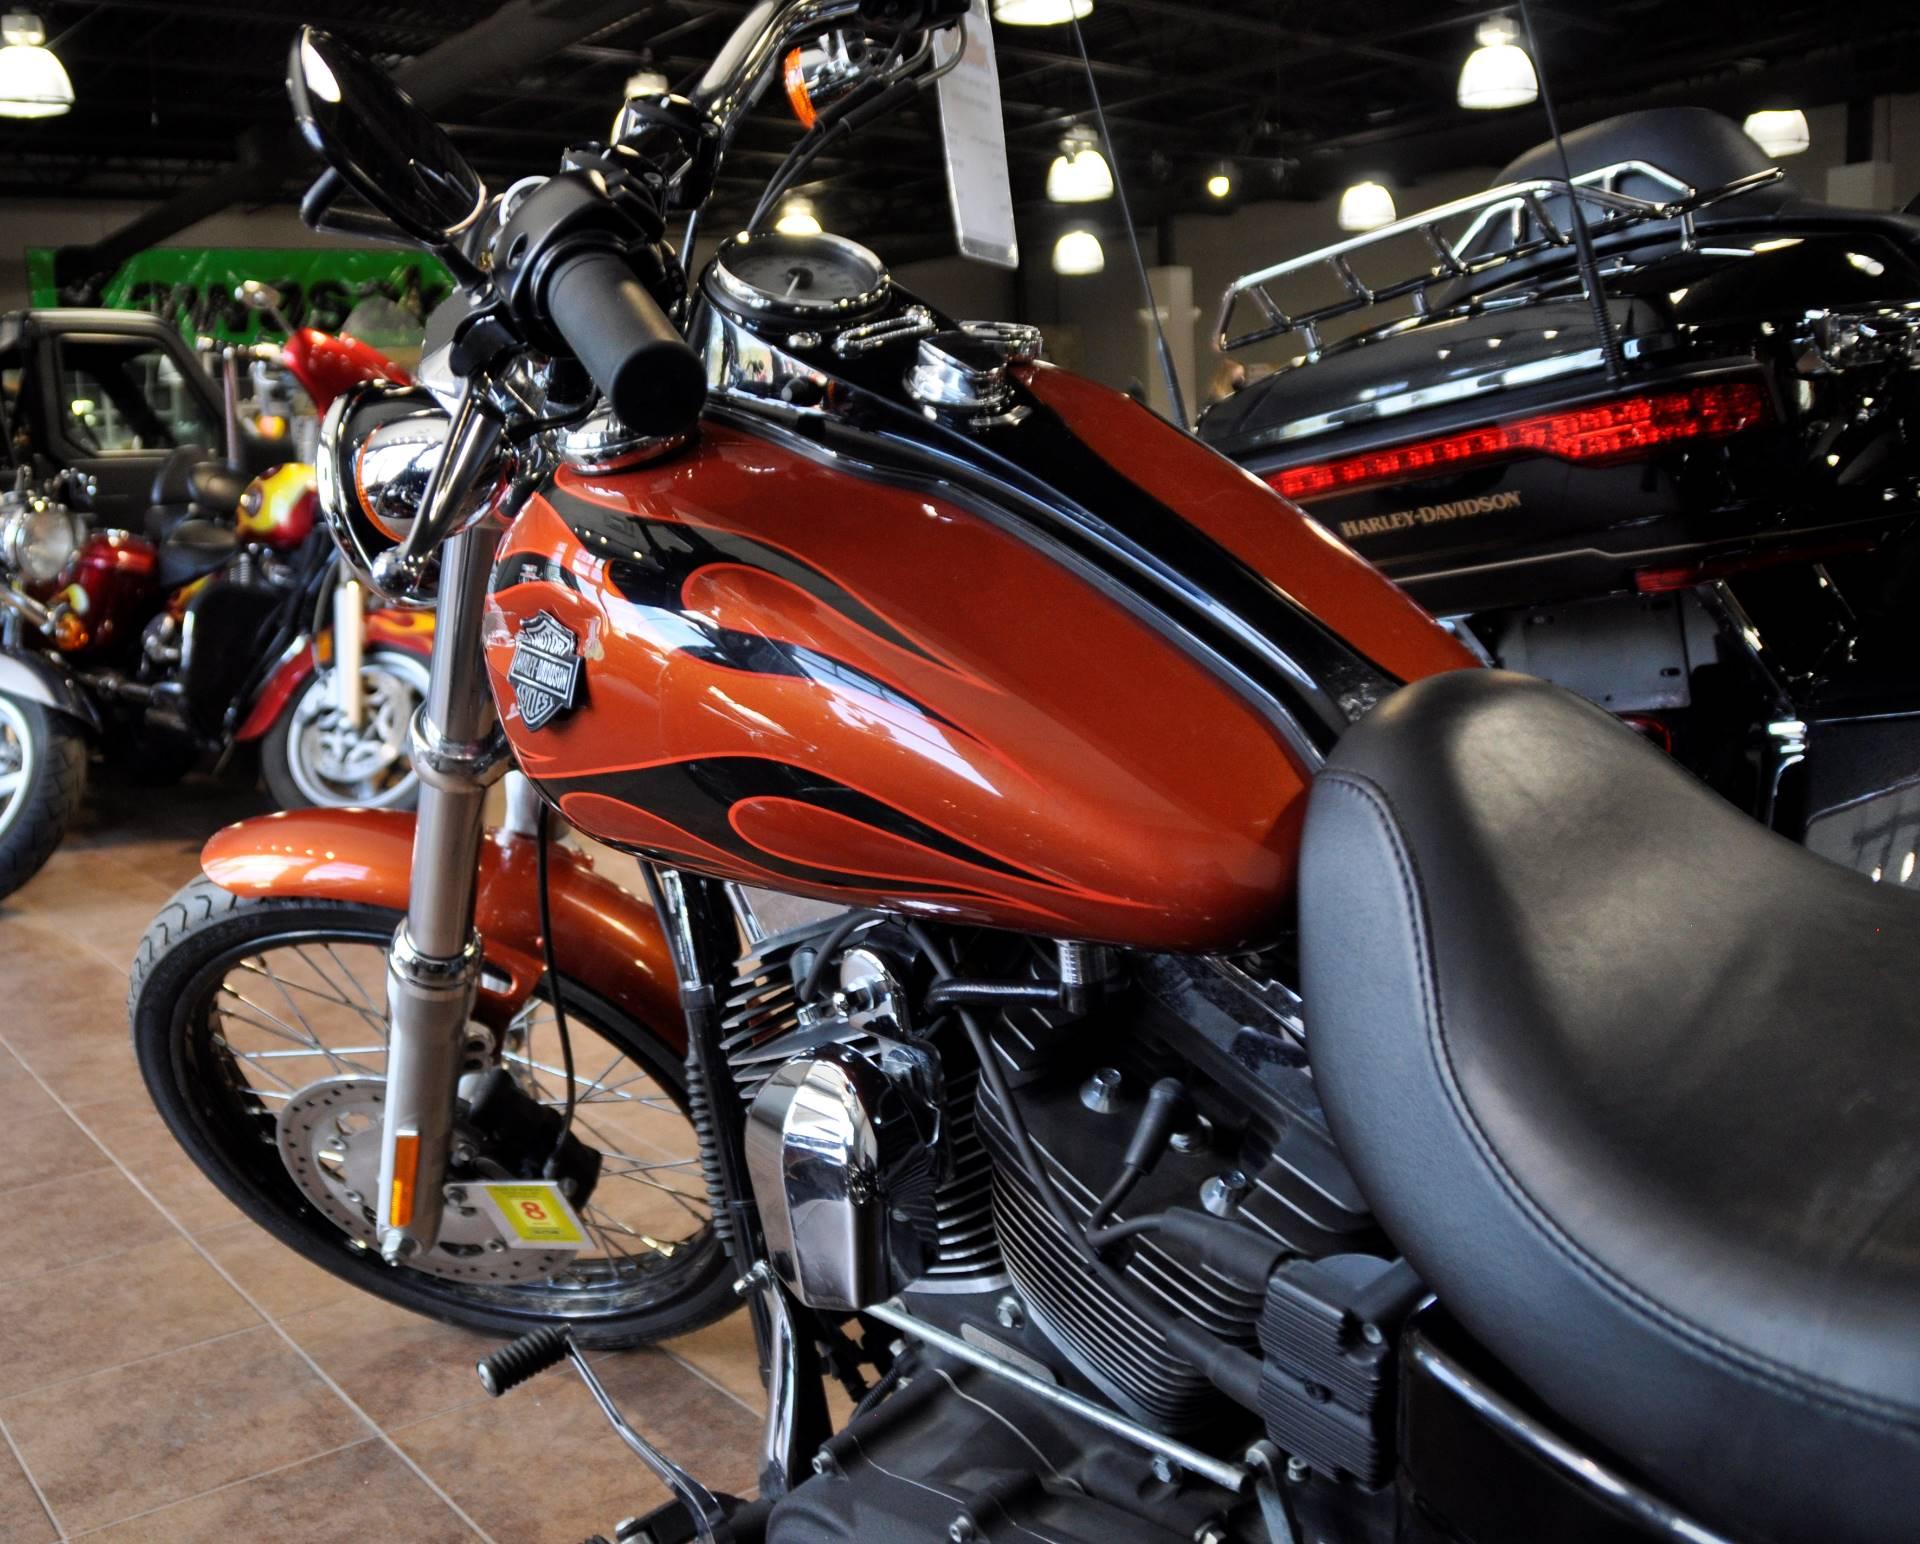 2011 Harley-Davidson Dyna Wide Glide 5